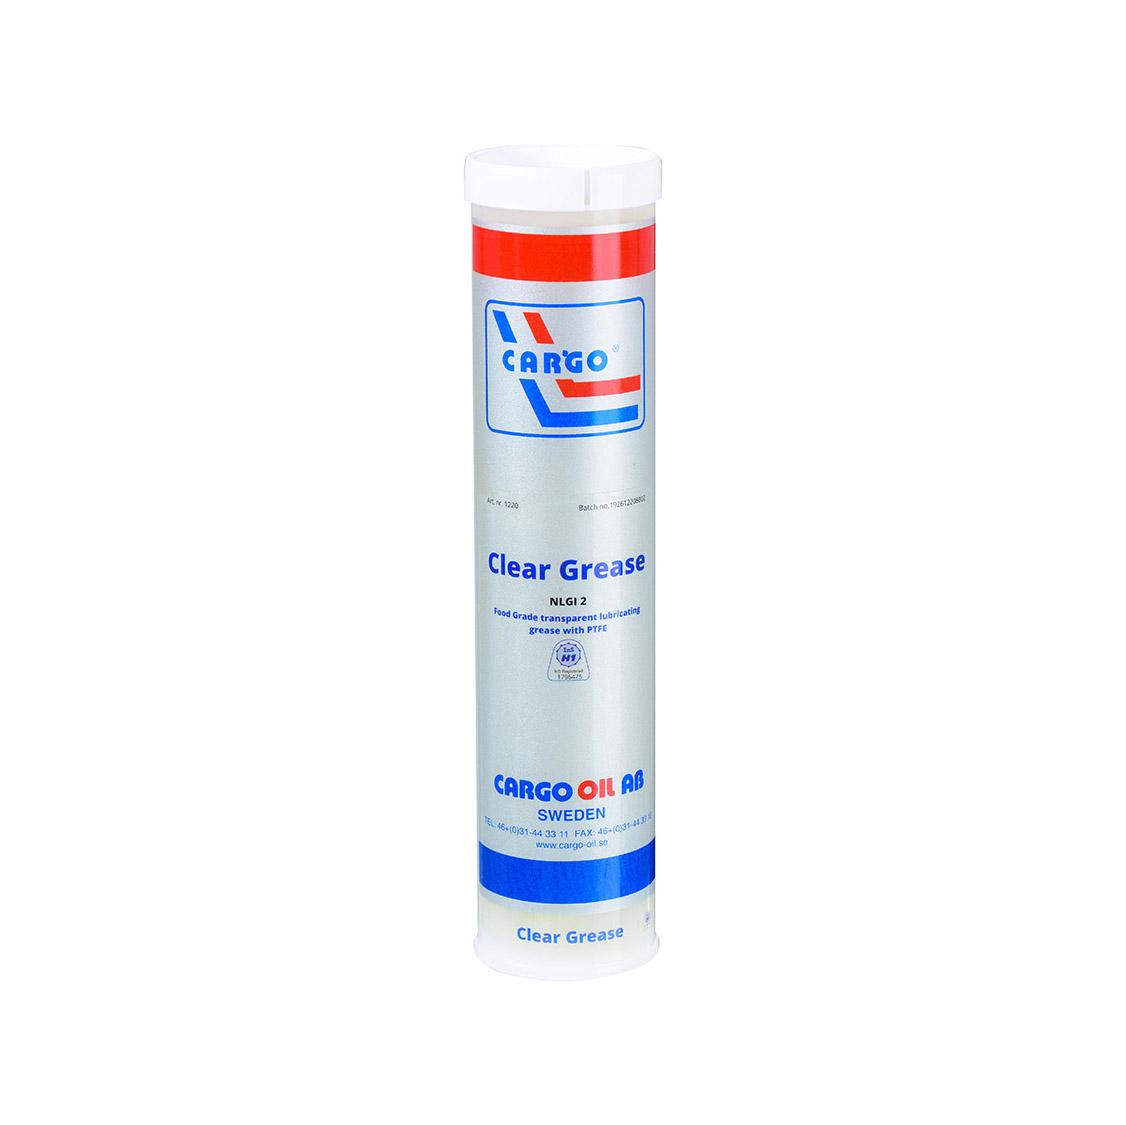 Clear Grease 含PTFE透明合成型润滑脂